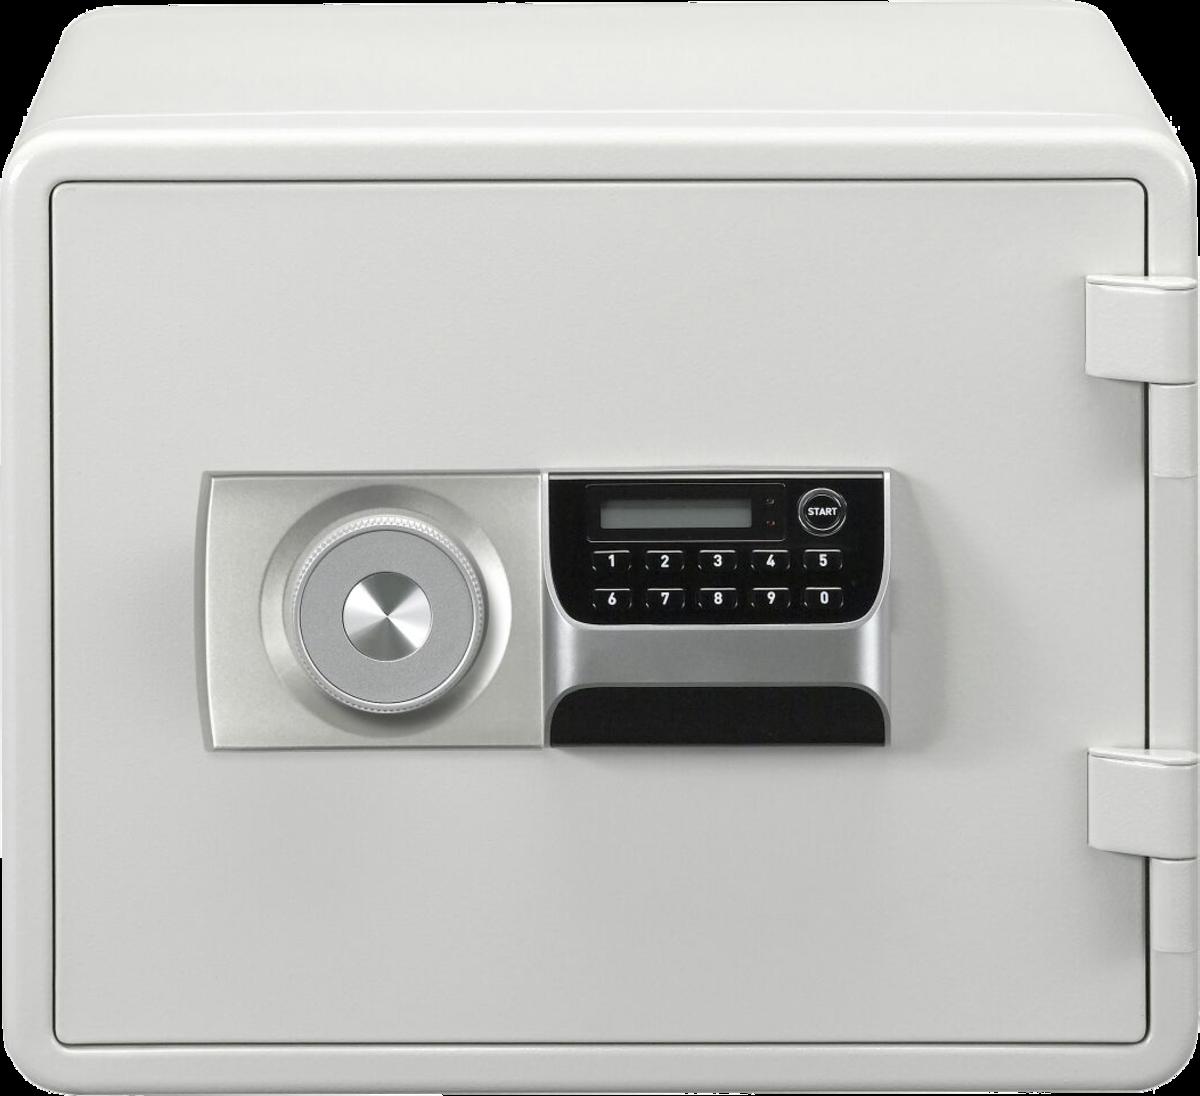 VM-021D/DK 電子密碼鎖/電子密碼鎖+鎖匙